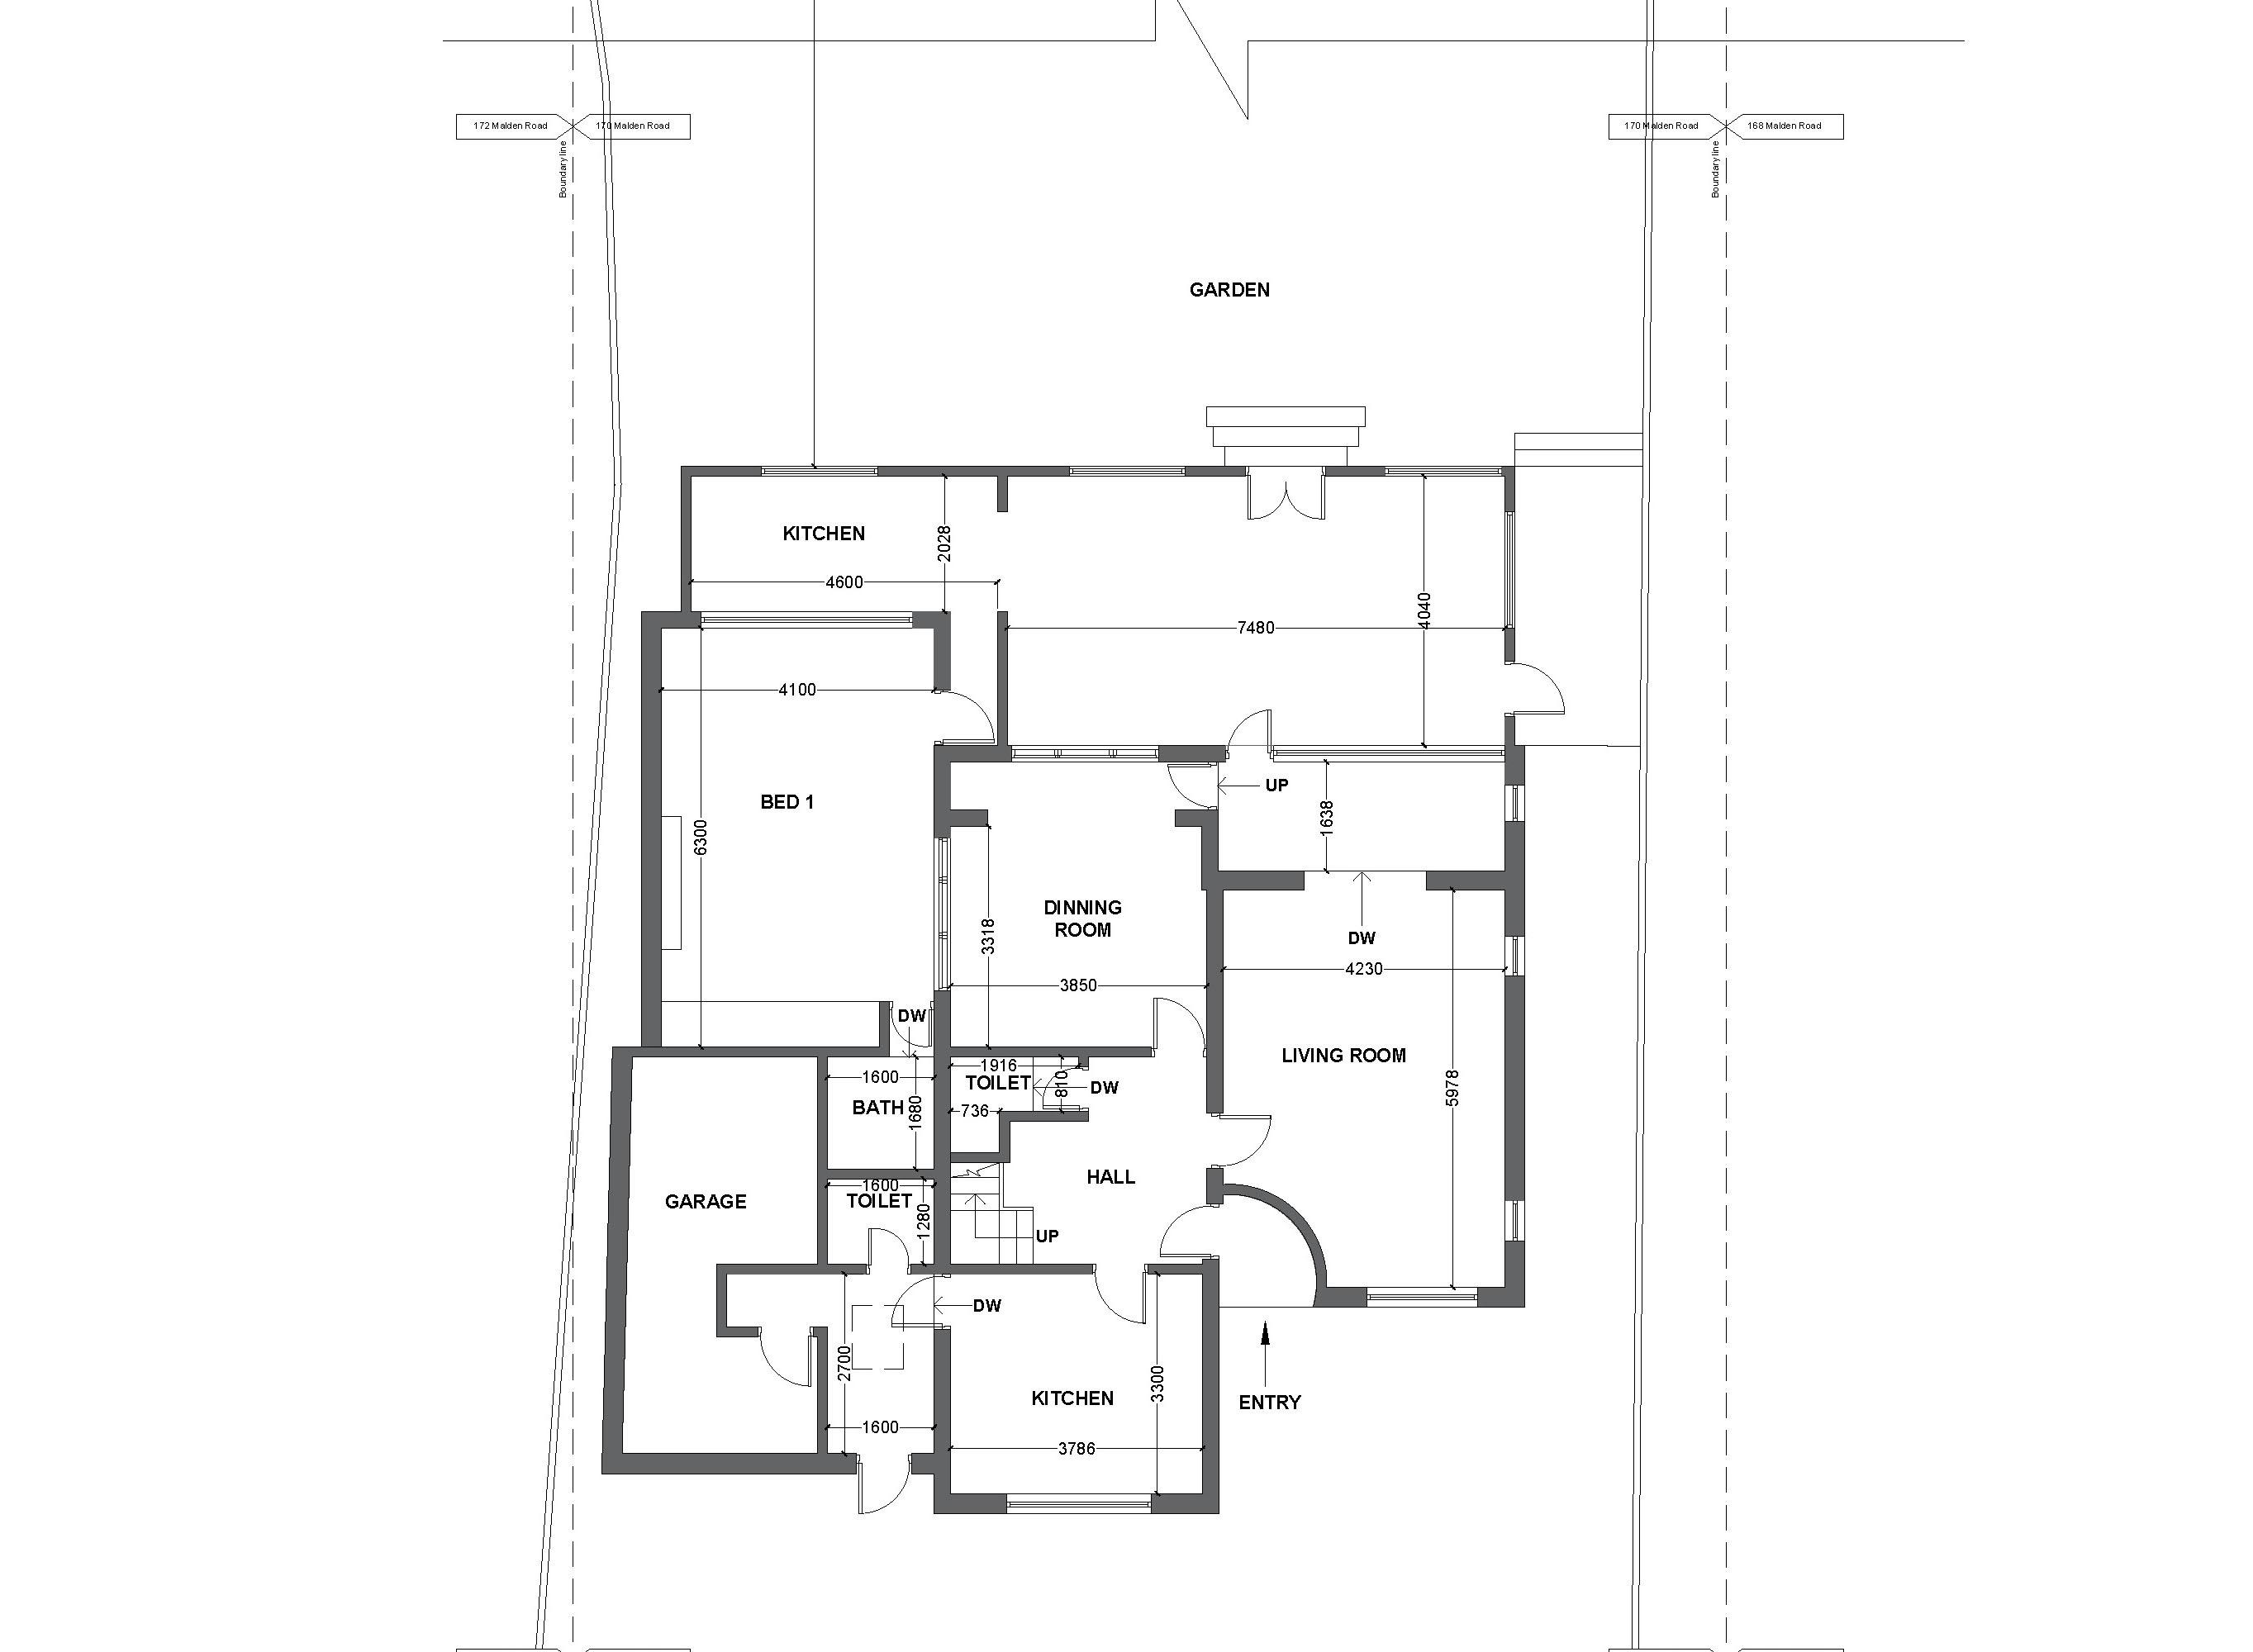 1 existing gound floor